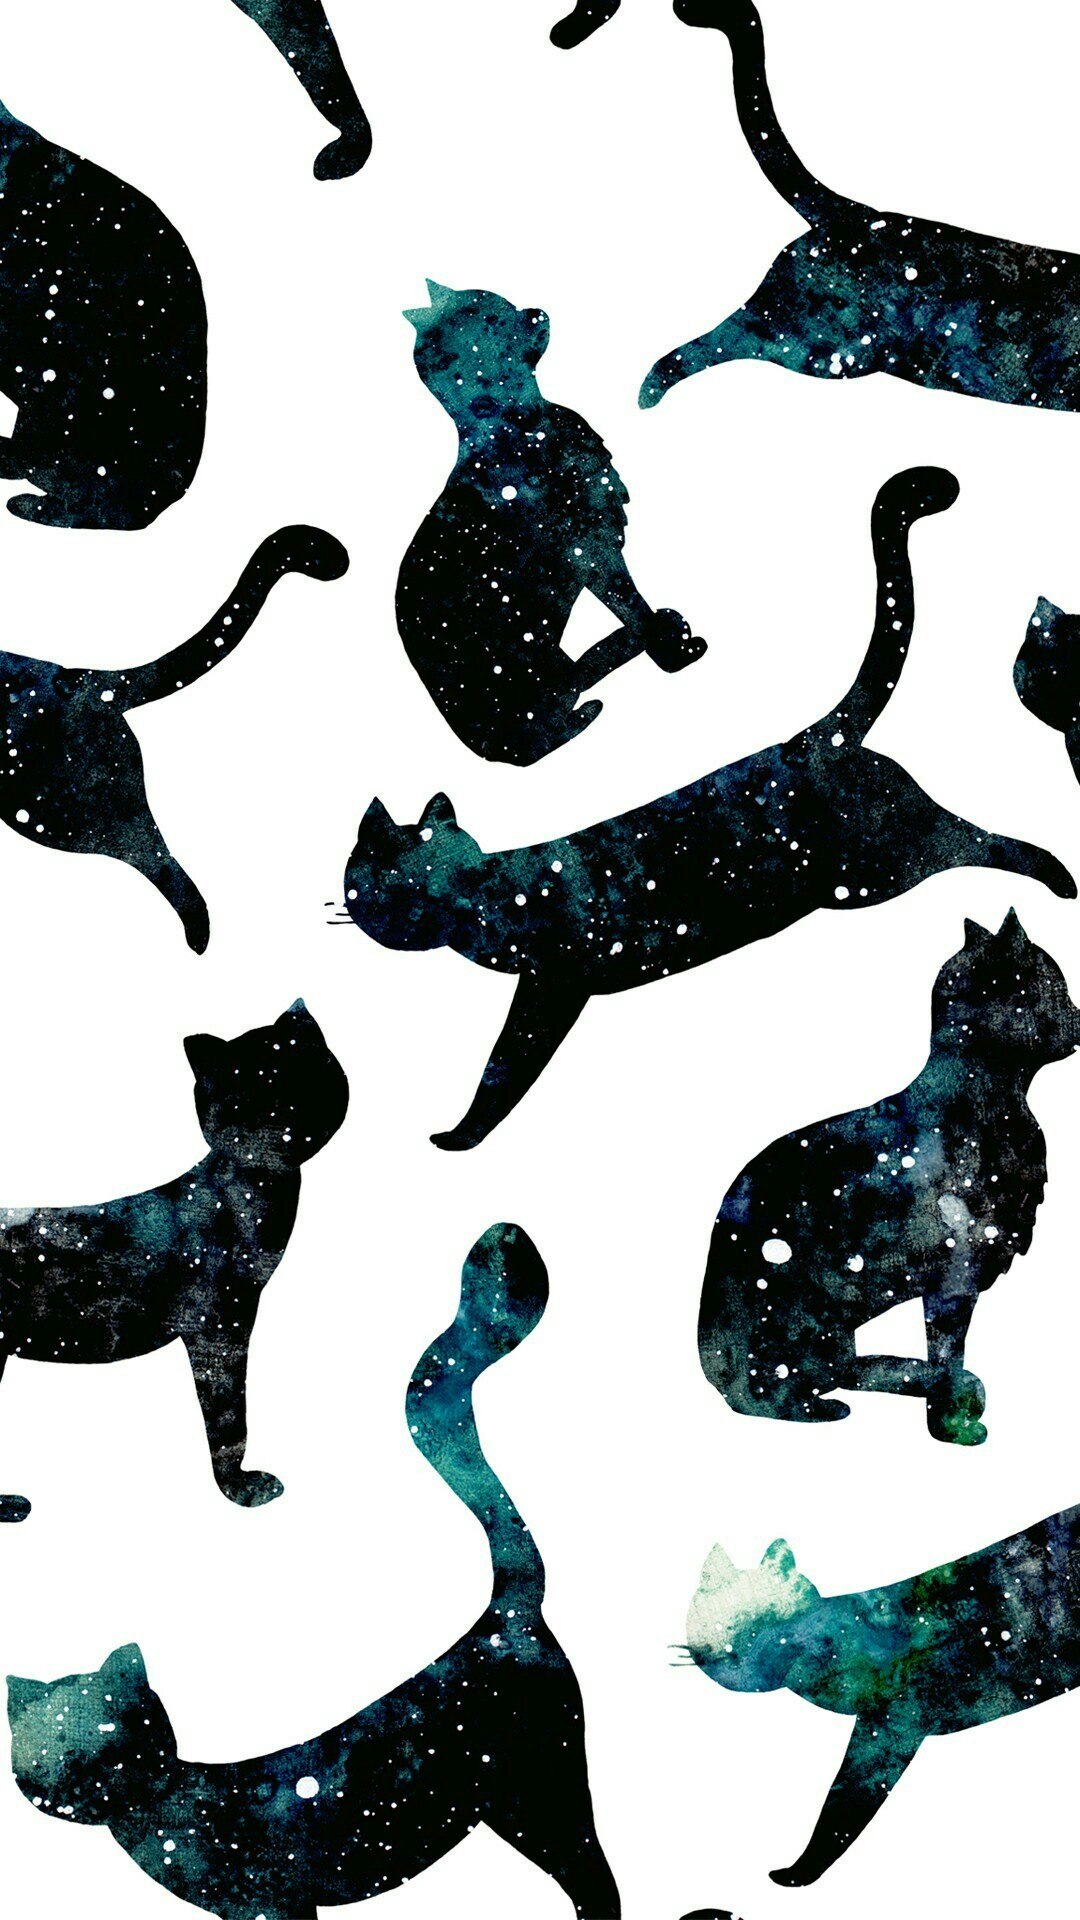 Wallpaper, Cat, Galaxy   Data-src - Cat Wallpaper Phone - HD Wallpaper